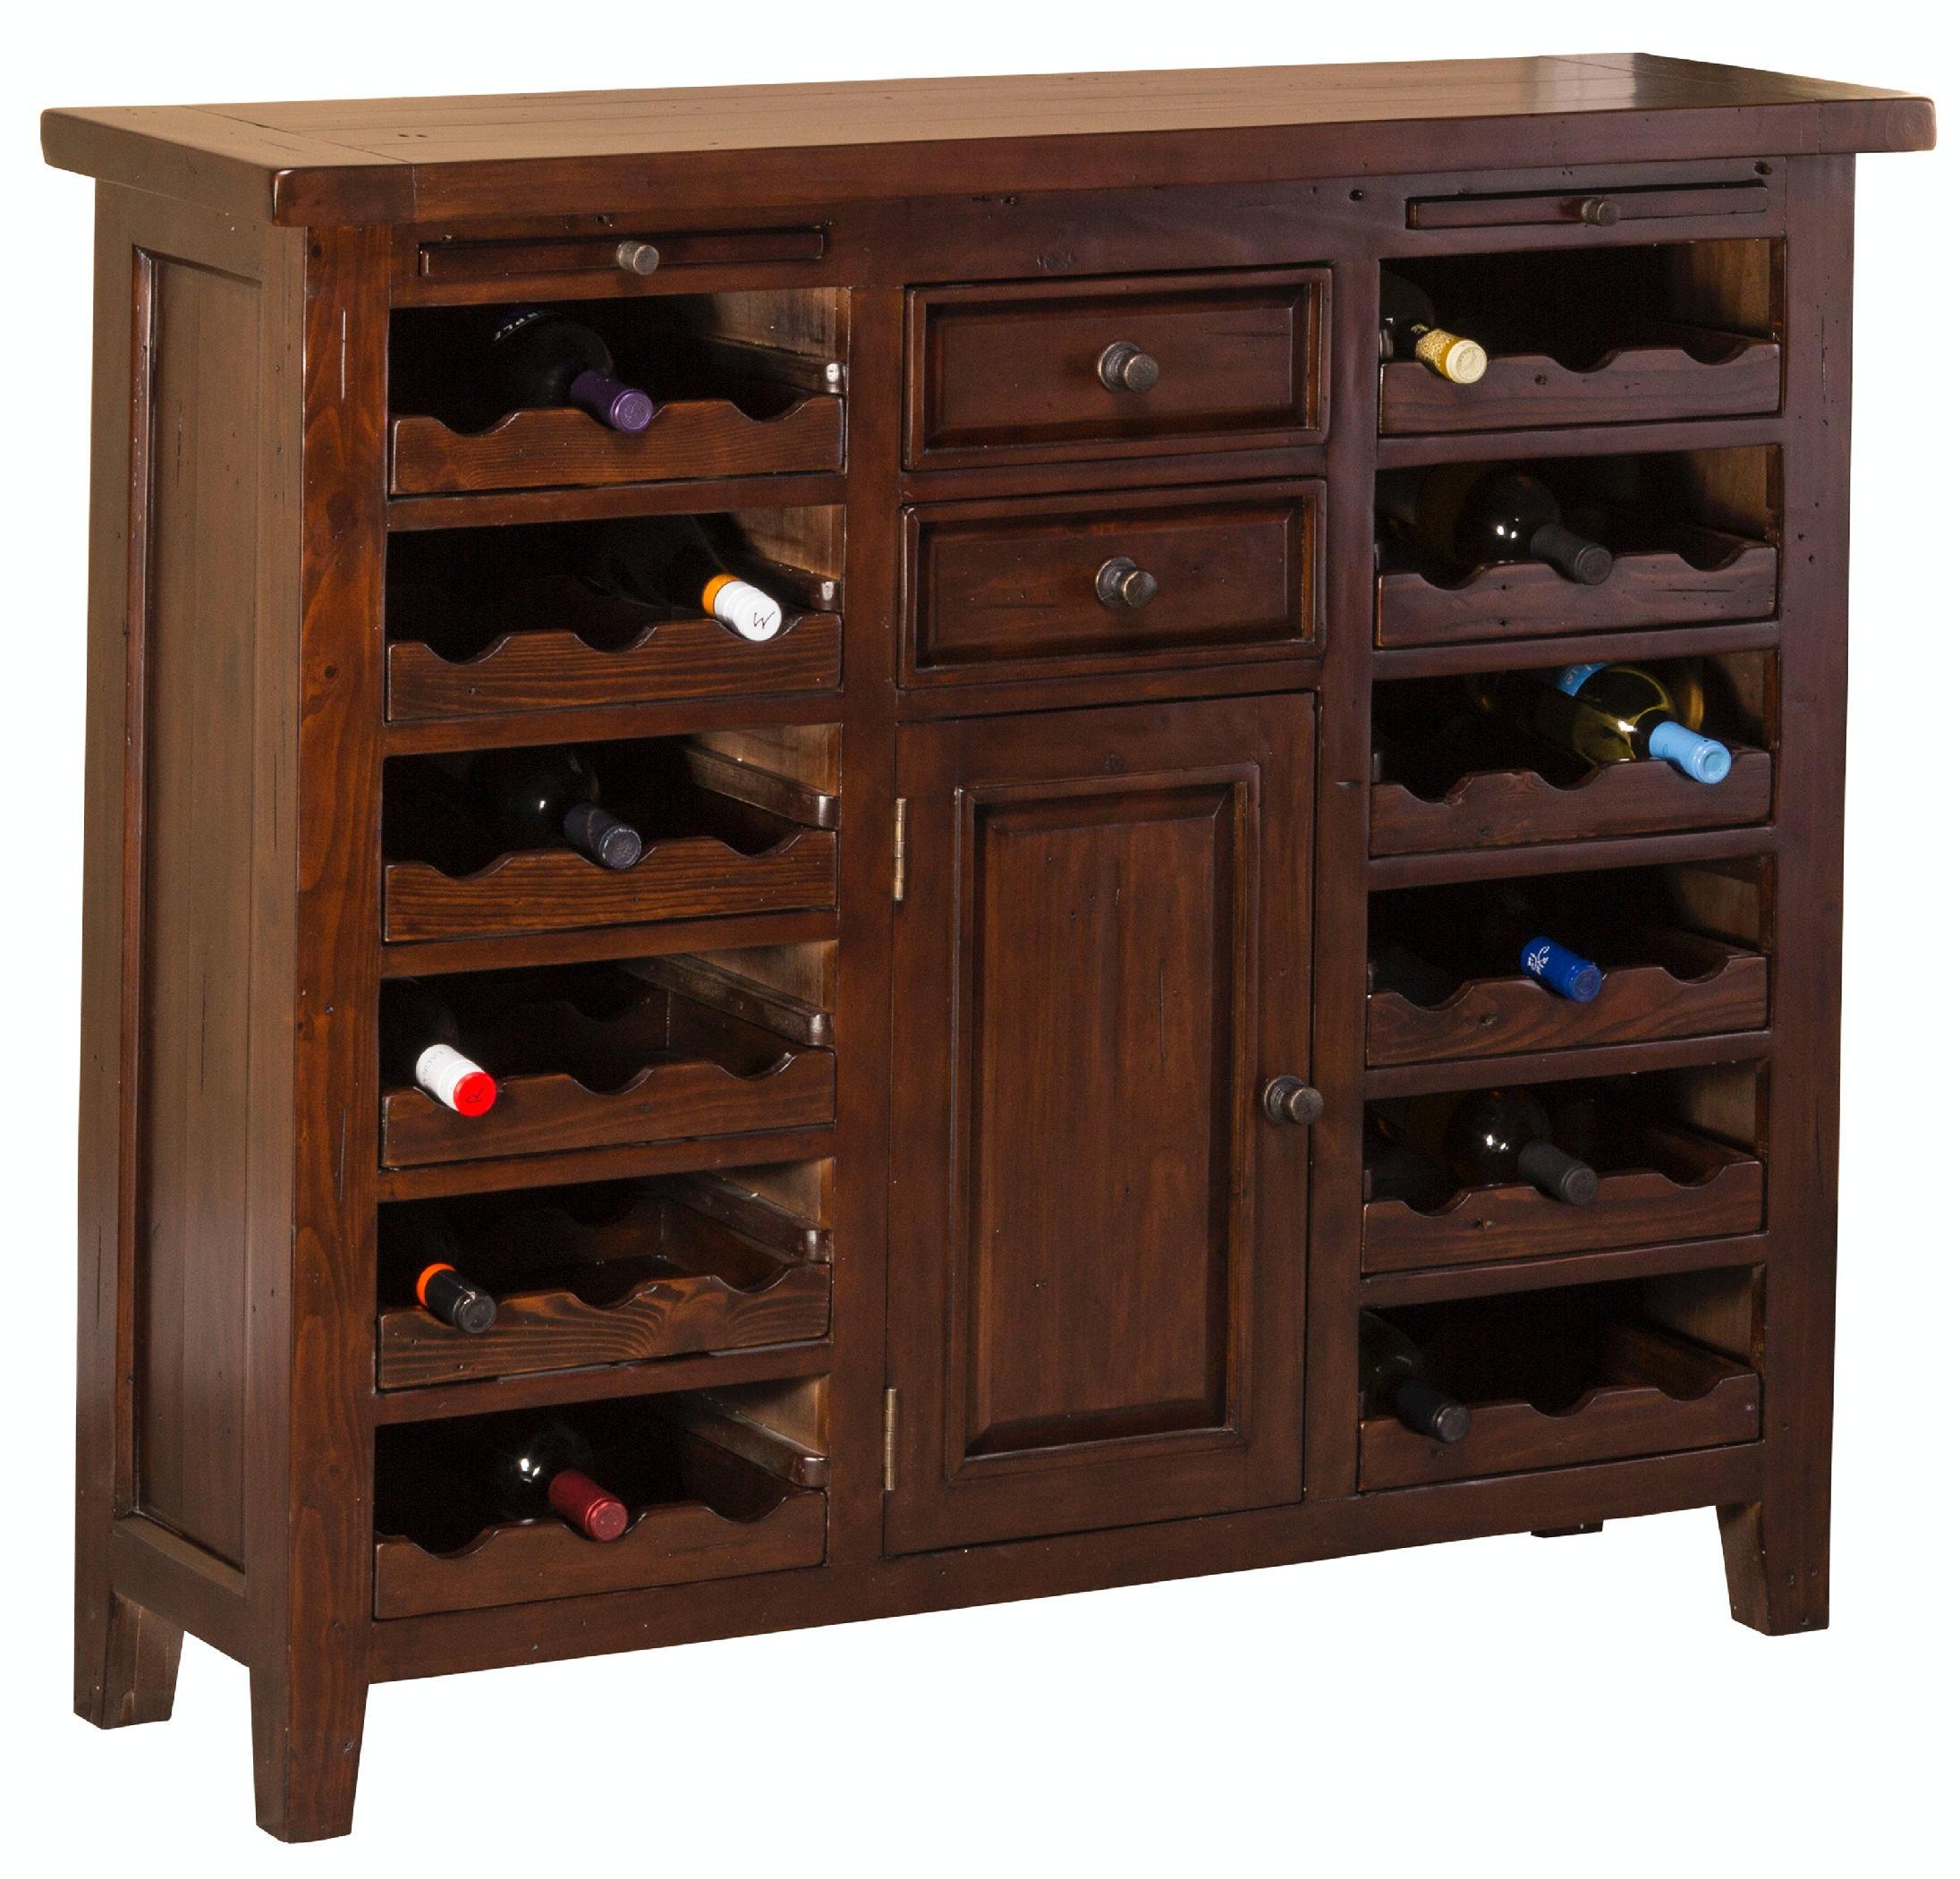 Hillsdale Furniture Tuscan Retreat® Wine Console/Storage Unit 4793-948W  sc 1 st  Winner Furniture & Hillsdale Furniture Bar and Game Room Tuscan Retreat® Wine Console ...